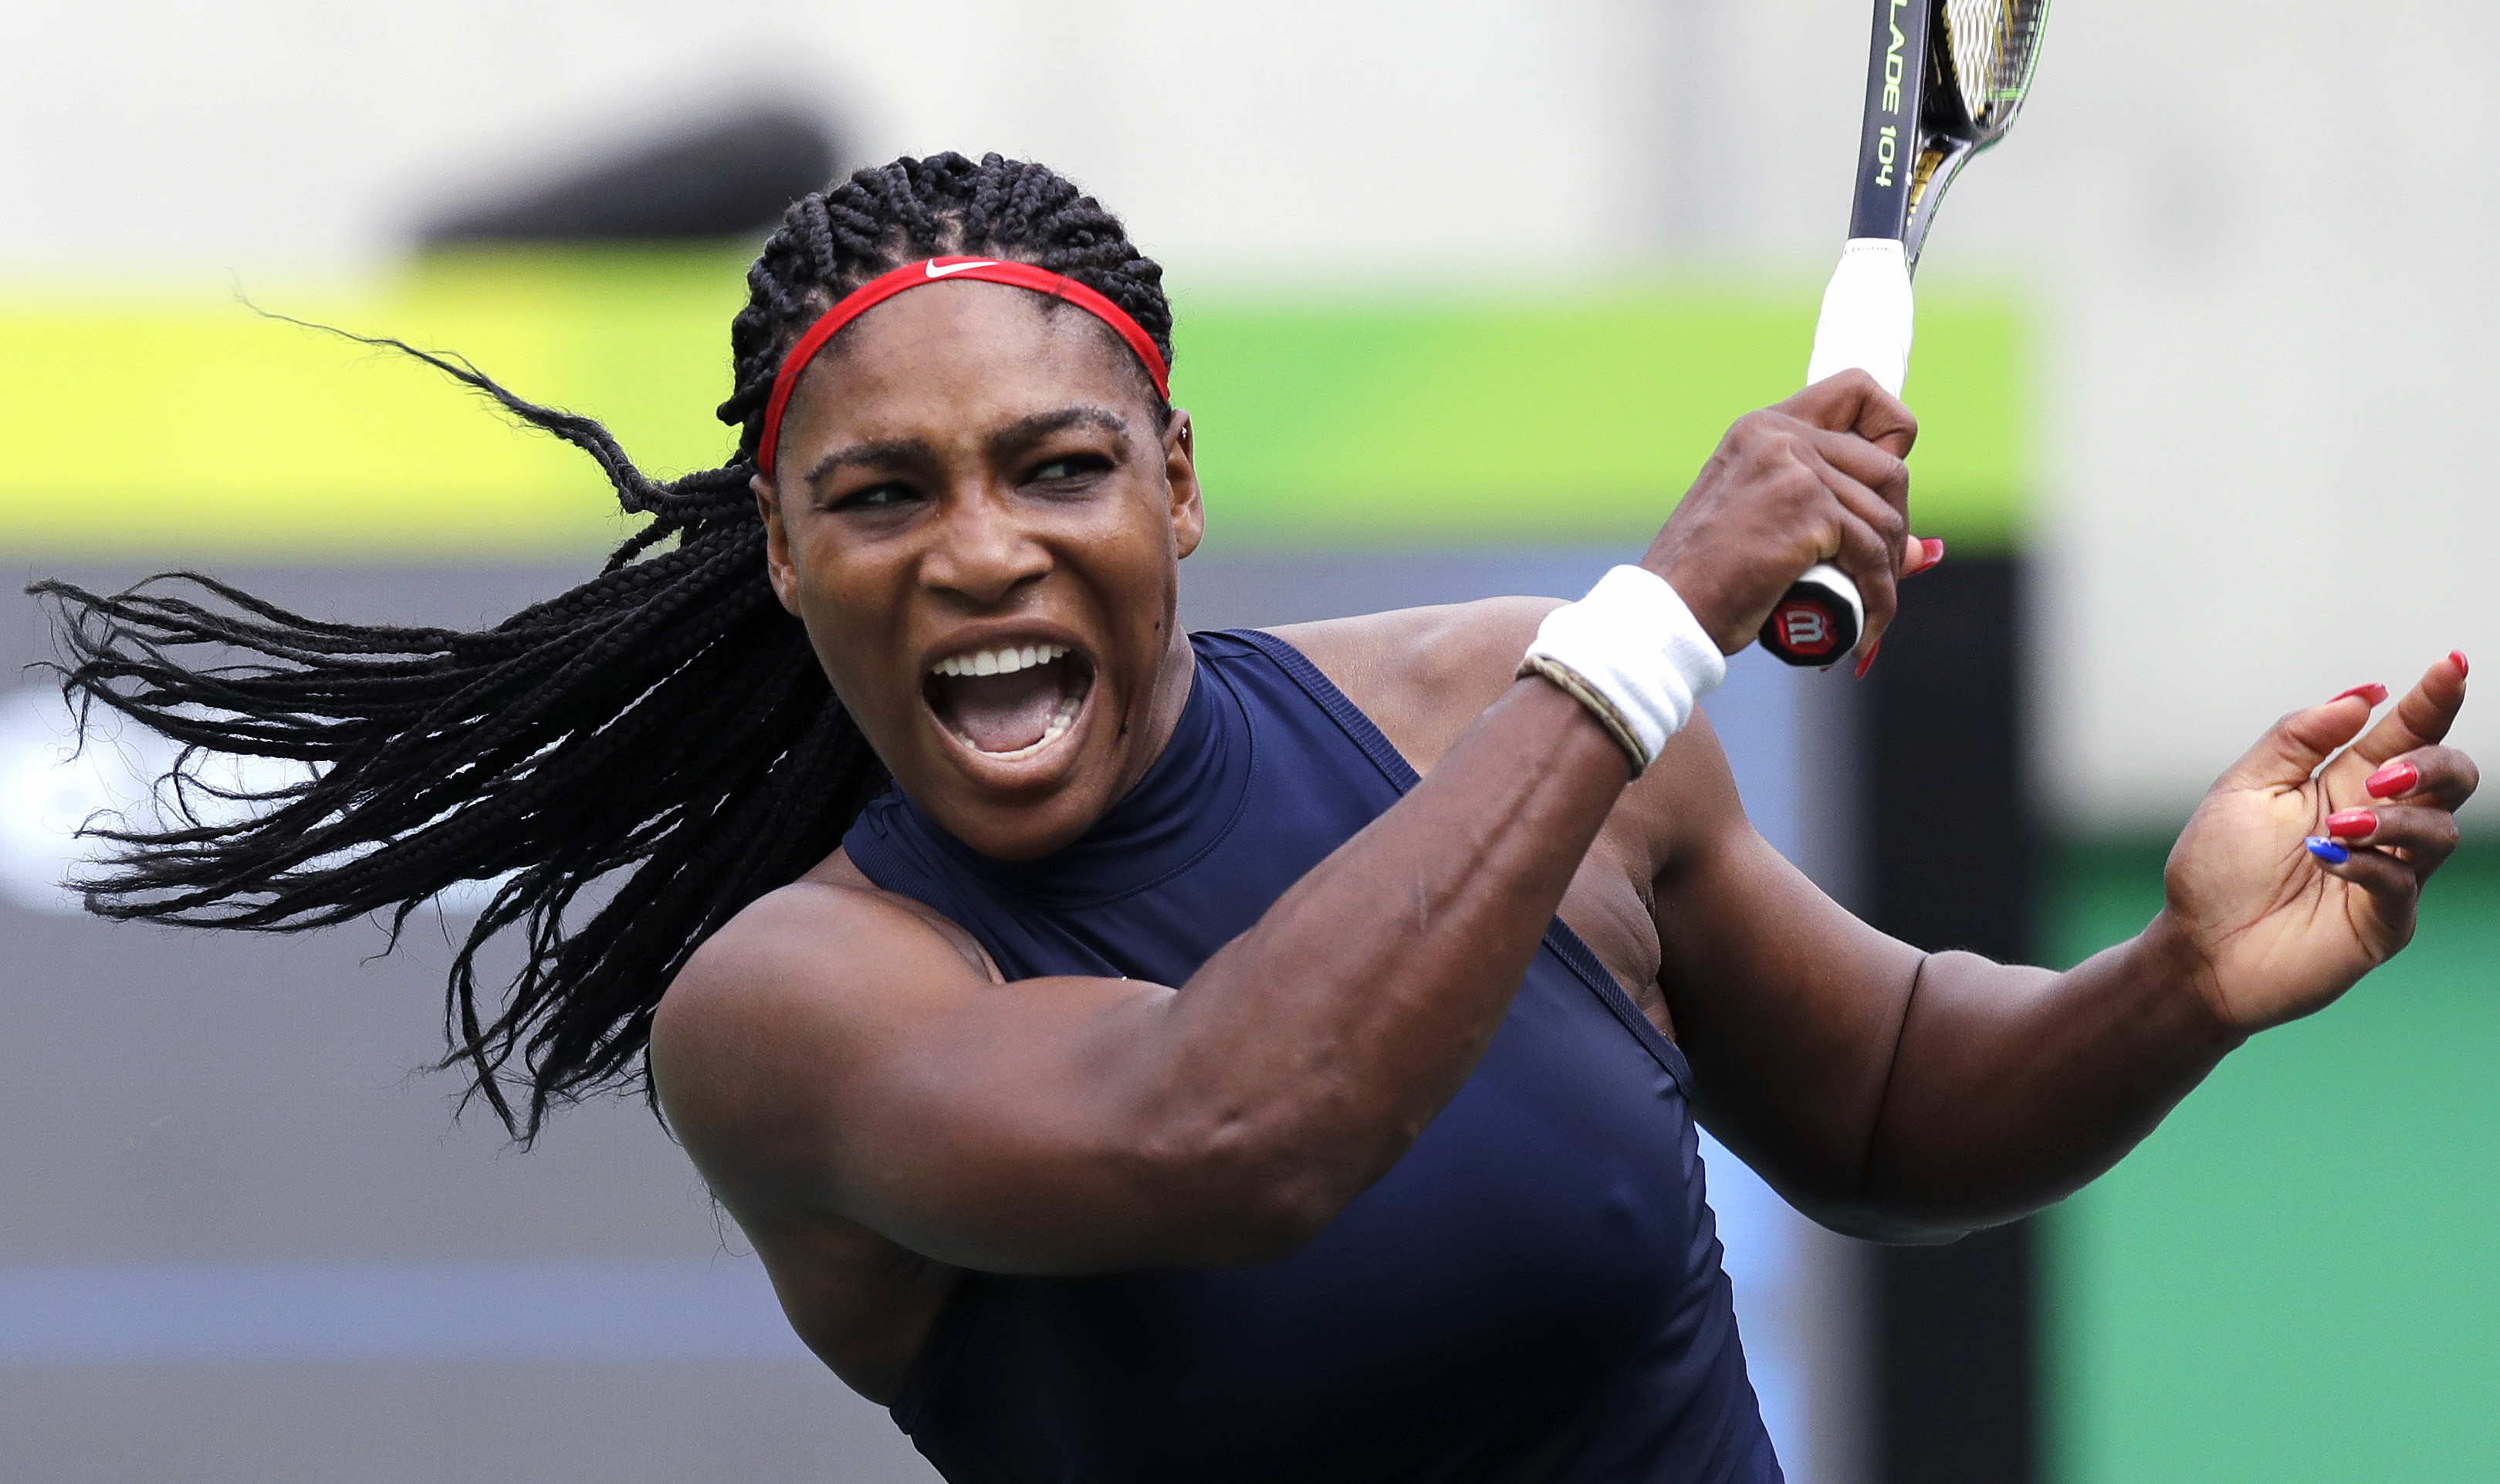 Serena Williams, of the United States, yells on a return against Daria Gavrilova, of Australia, at the 2016 Summer Olympics in Rio de Janeiro, Brazil, Sunday, Aug. 7, 2016. (AP Photo/Charles Krupa)